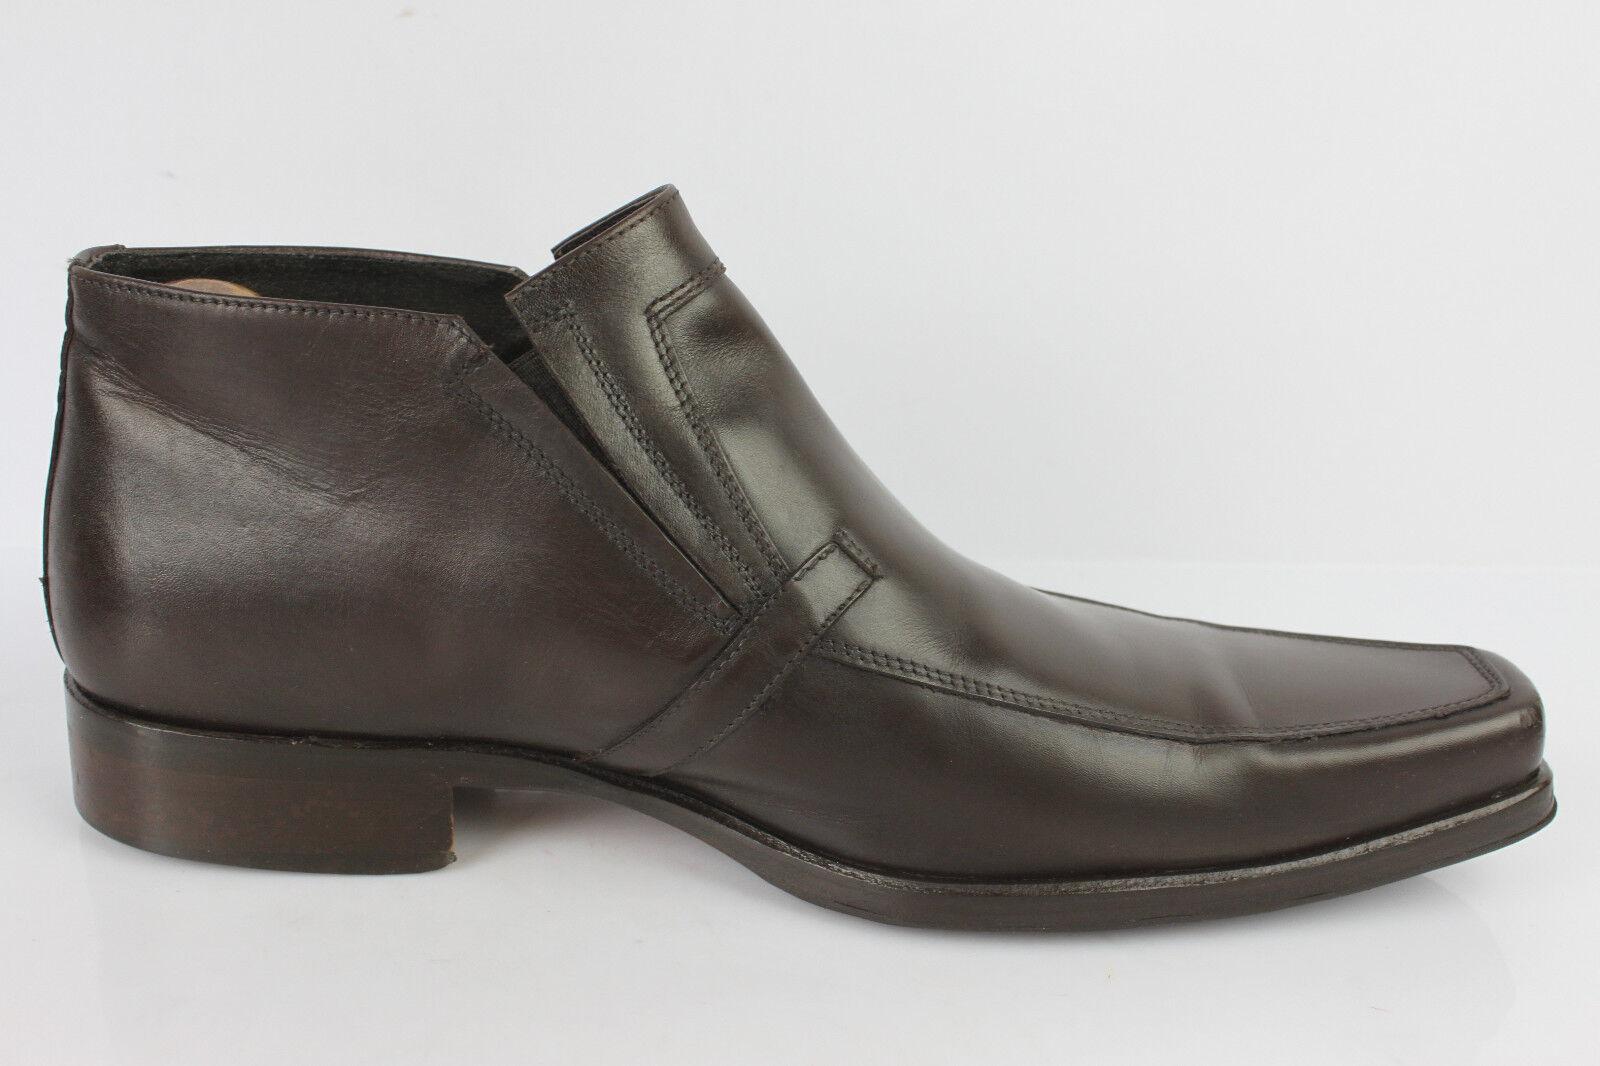 Bottines botas Tout Cuir Marron Marron Marron Made in Italy IT 44 / FR 45 TBE 2596ad